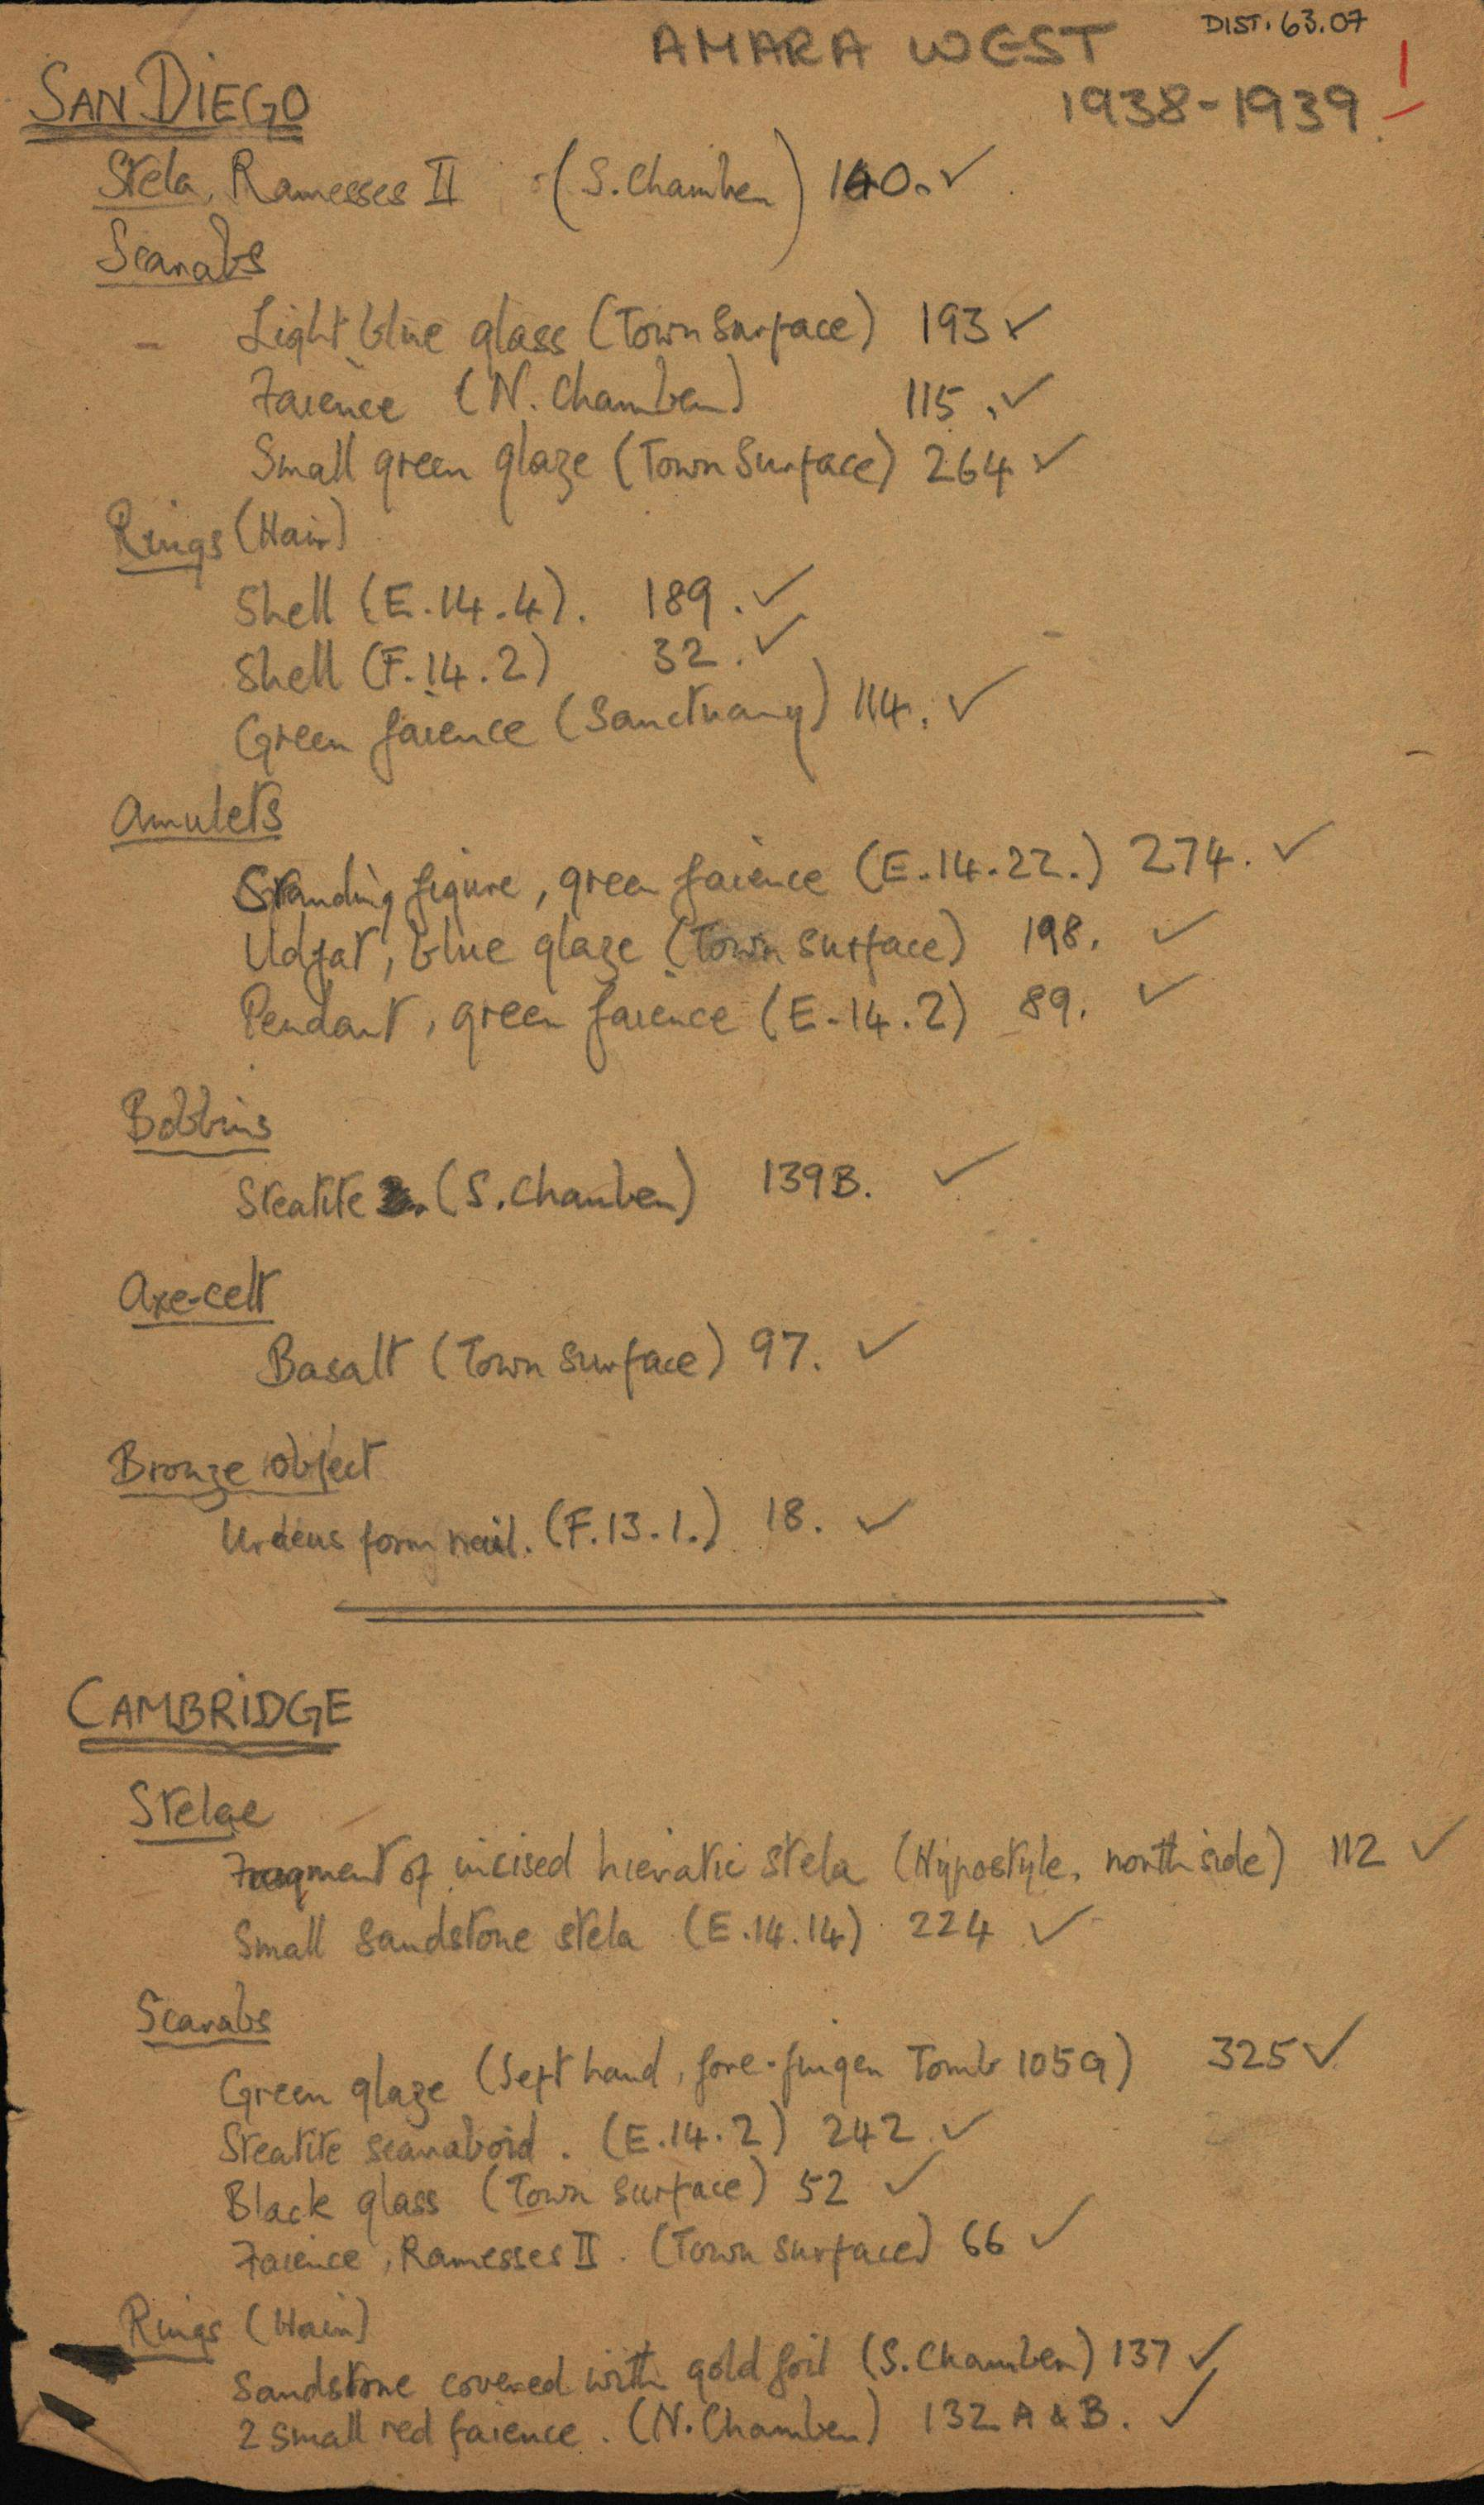 1936-39 Amarah West, Sesebi DIST.63.07a